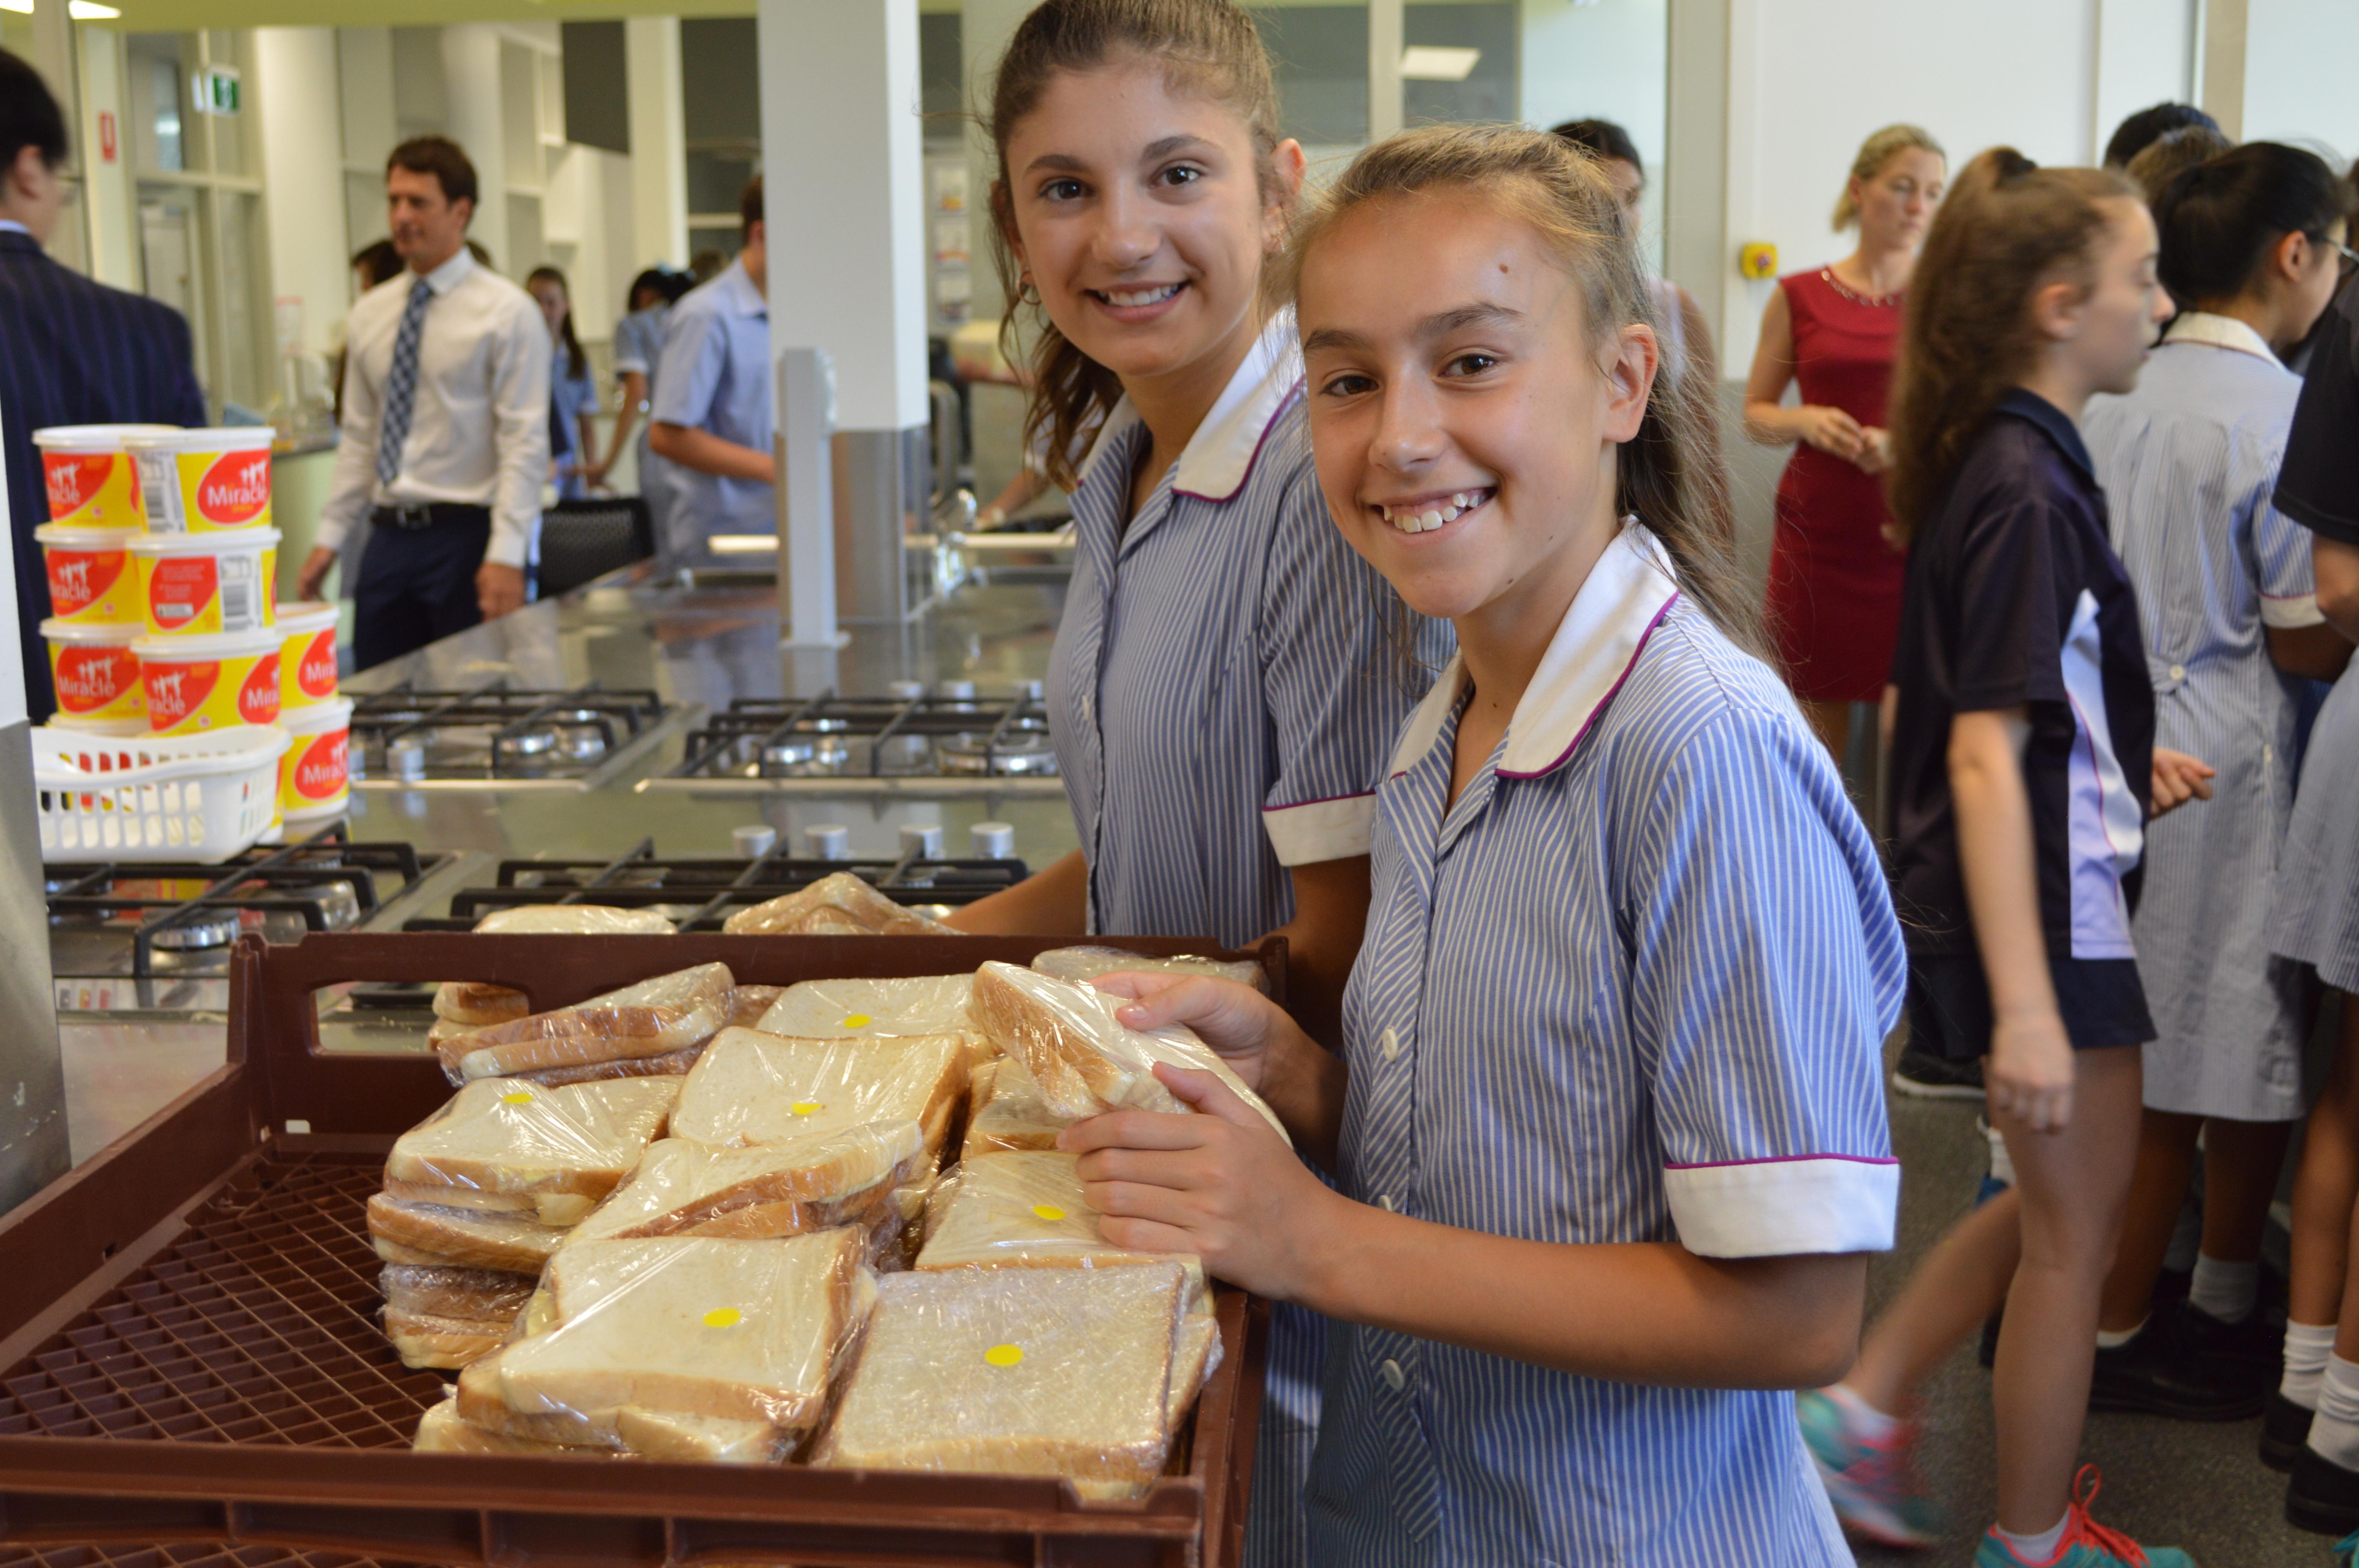 Making sandwiches for Eat Up Australia